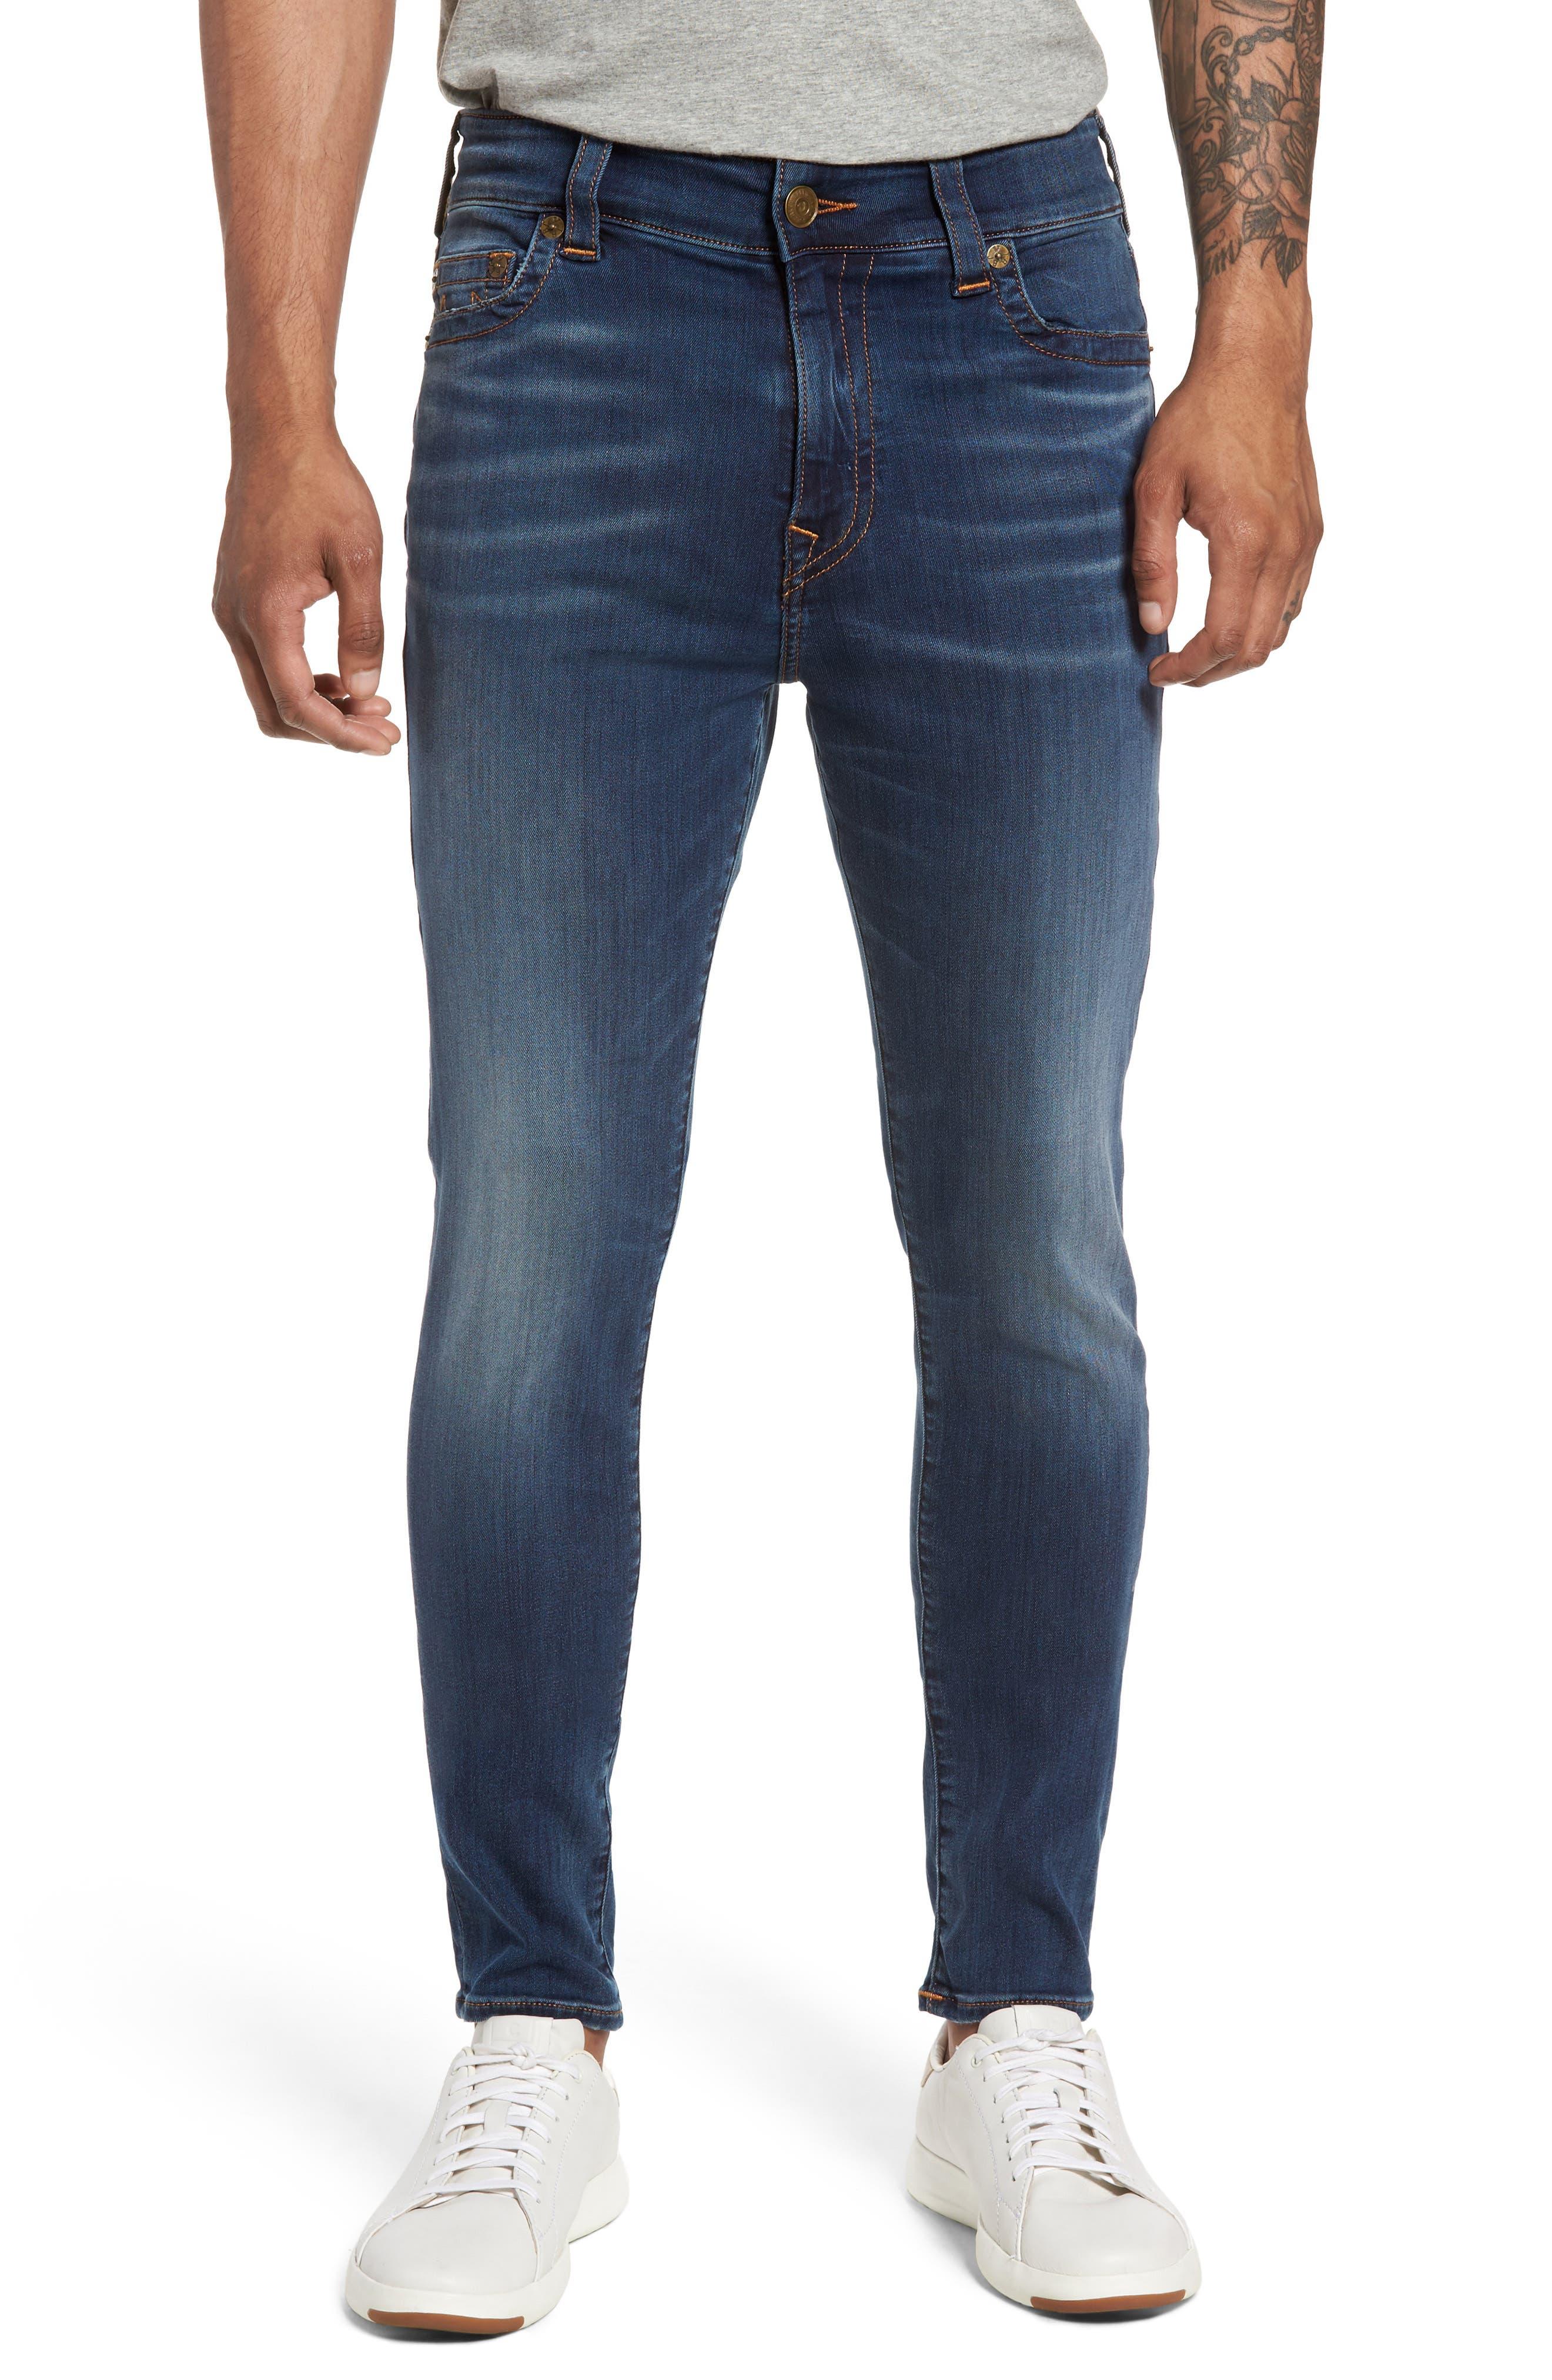 Main Image - True Religion Brand Jeans Jack Skinny Fit Jeans (Desert Highway)